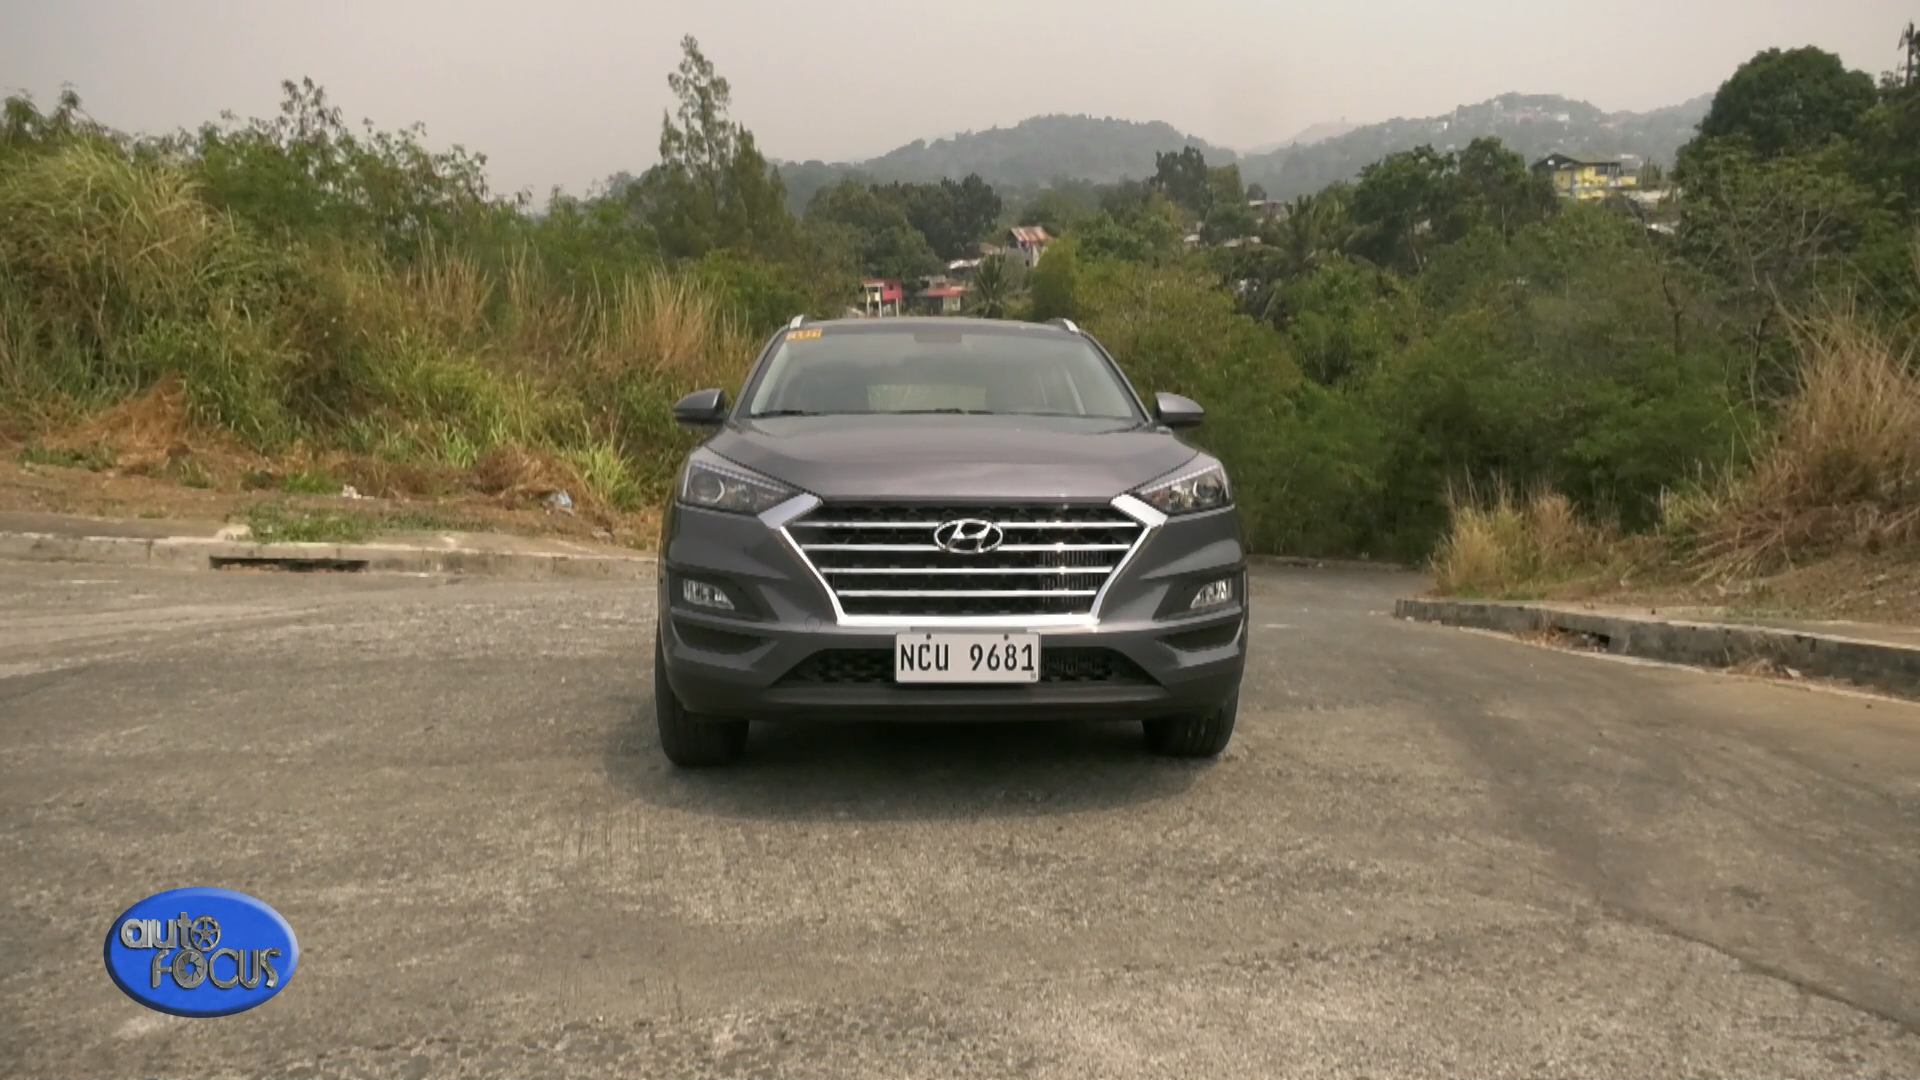 Production Models 2019 Hyundai Tucson 2 0 D Gls Crdi 8 At 2wd